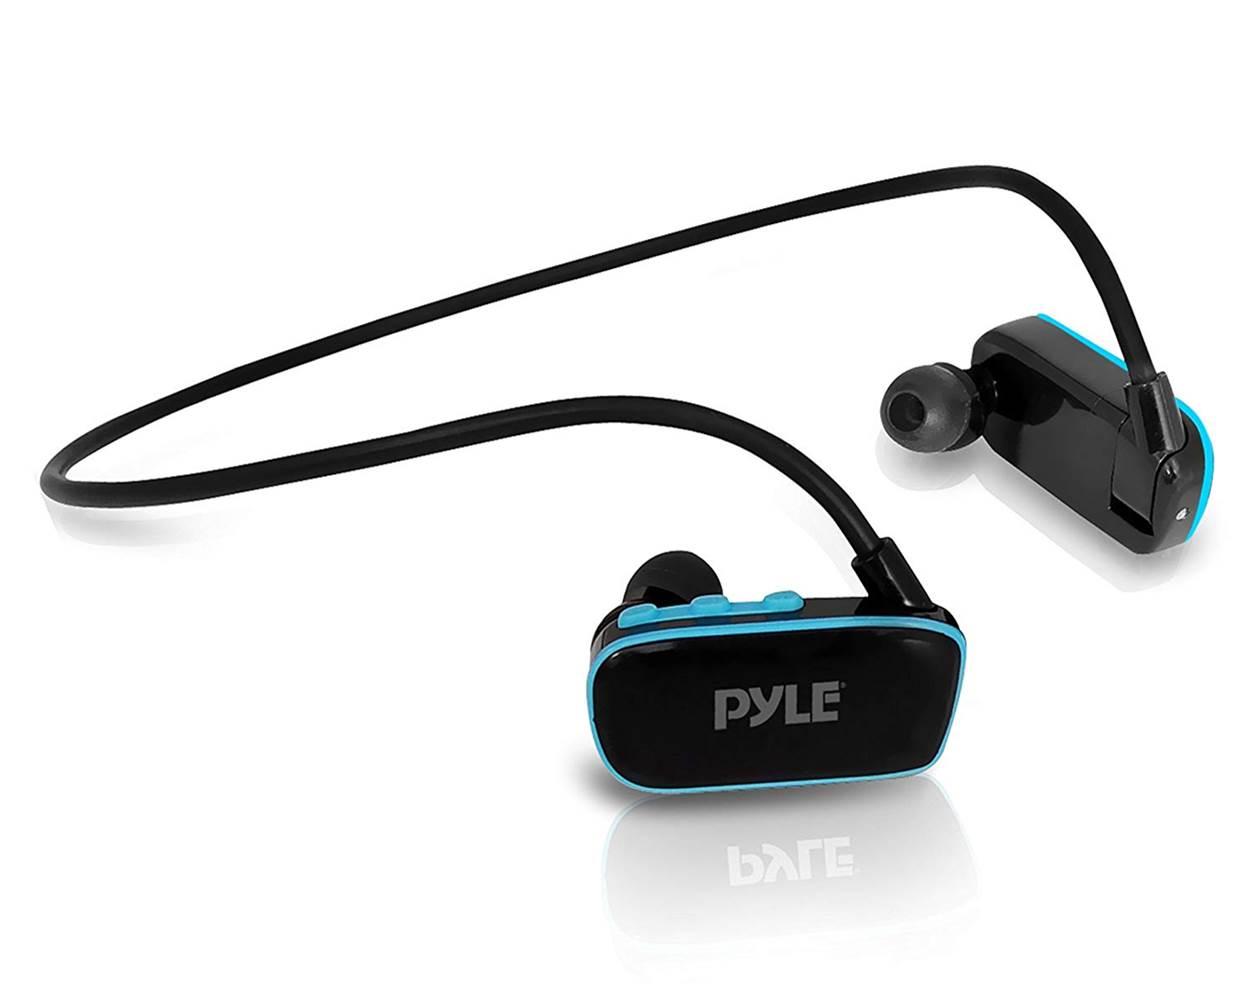 Pyle Neckband Waterproof Headphones for Swimming